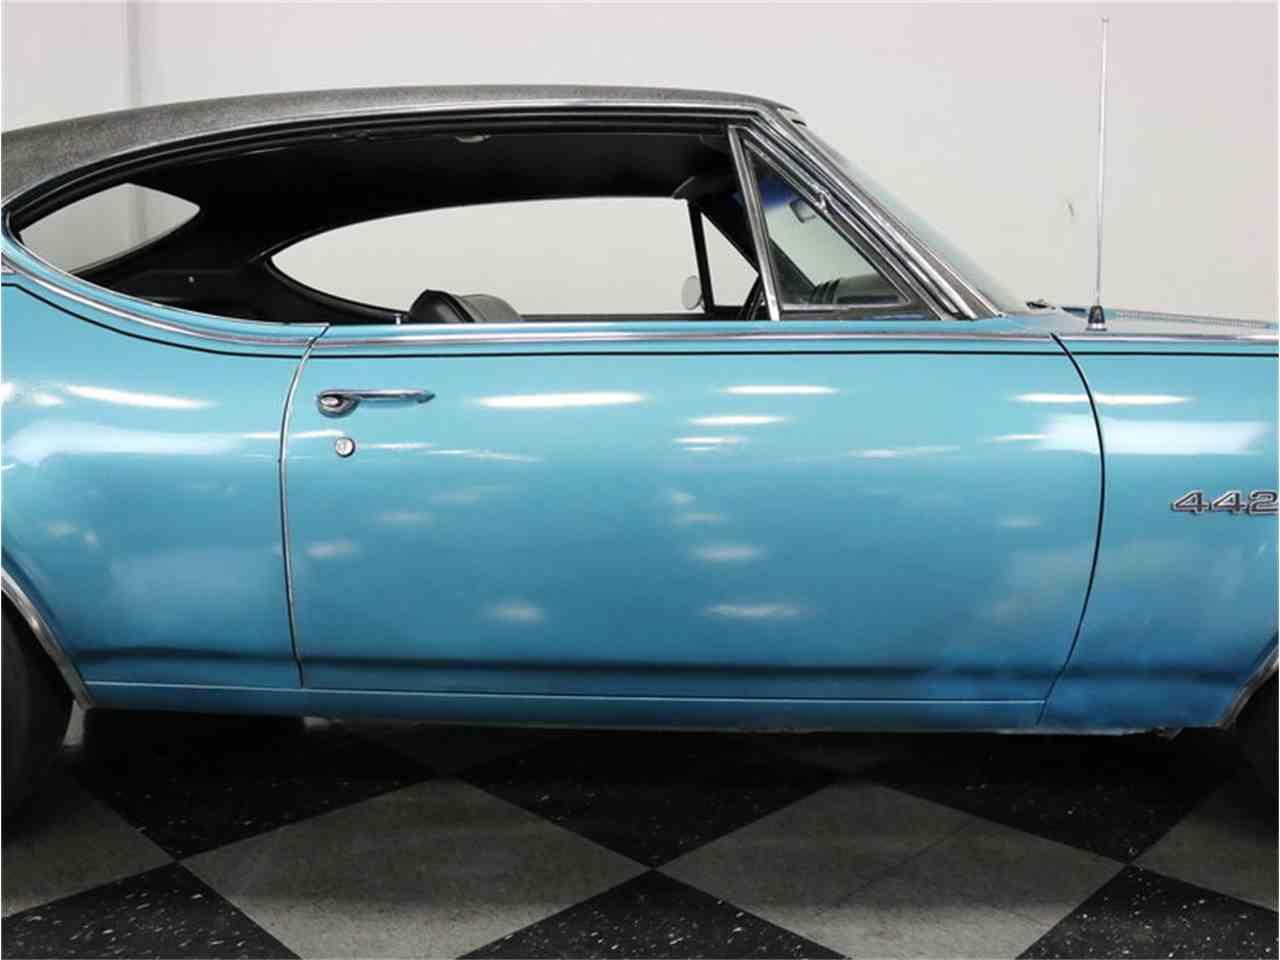 1968 Oldsmobile 442 for Sale | ClassicCars.com | CC-1042312